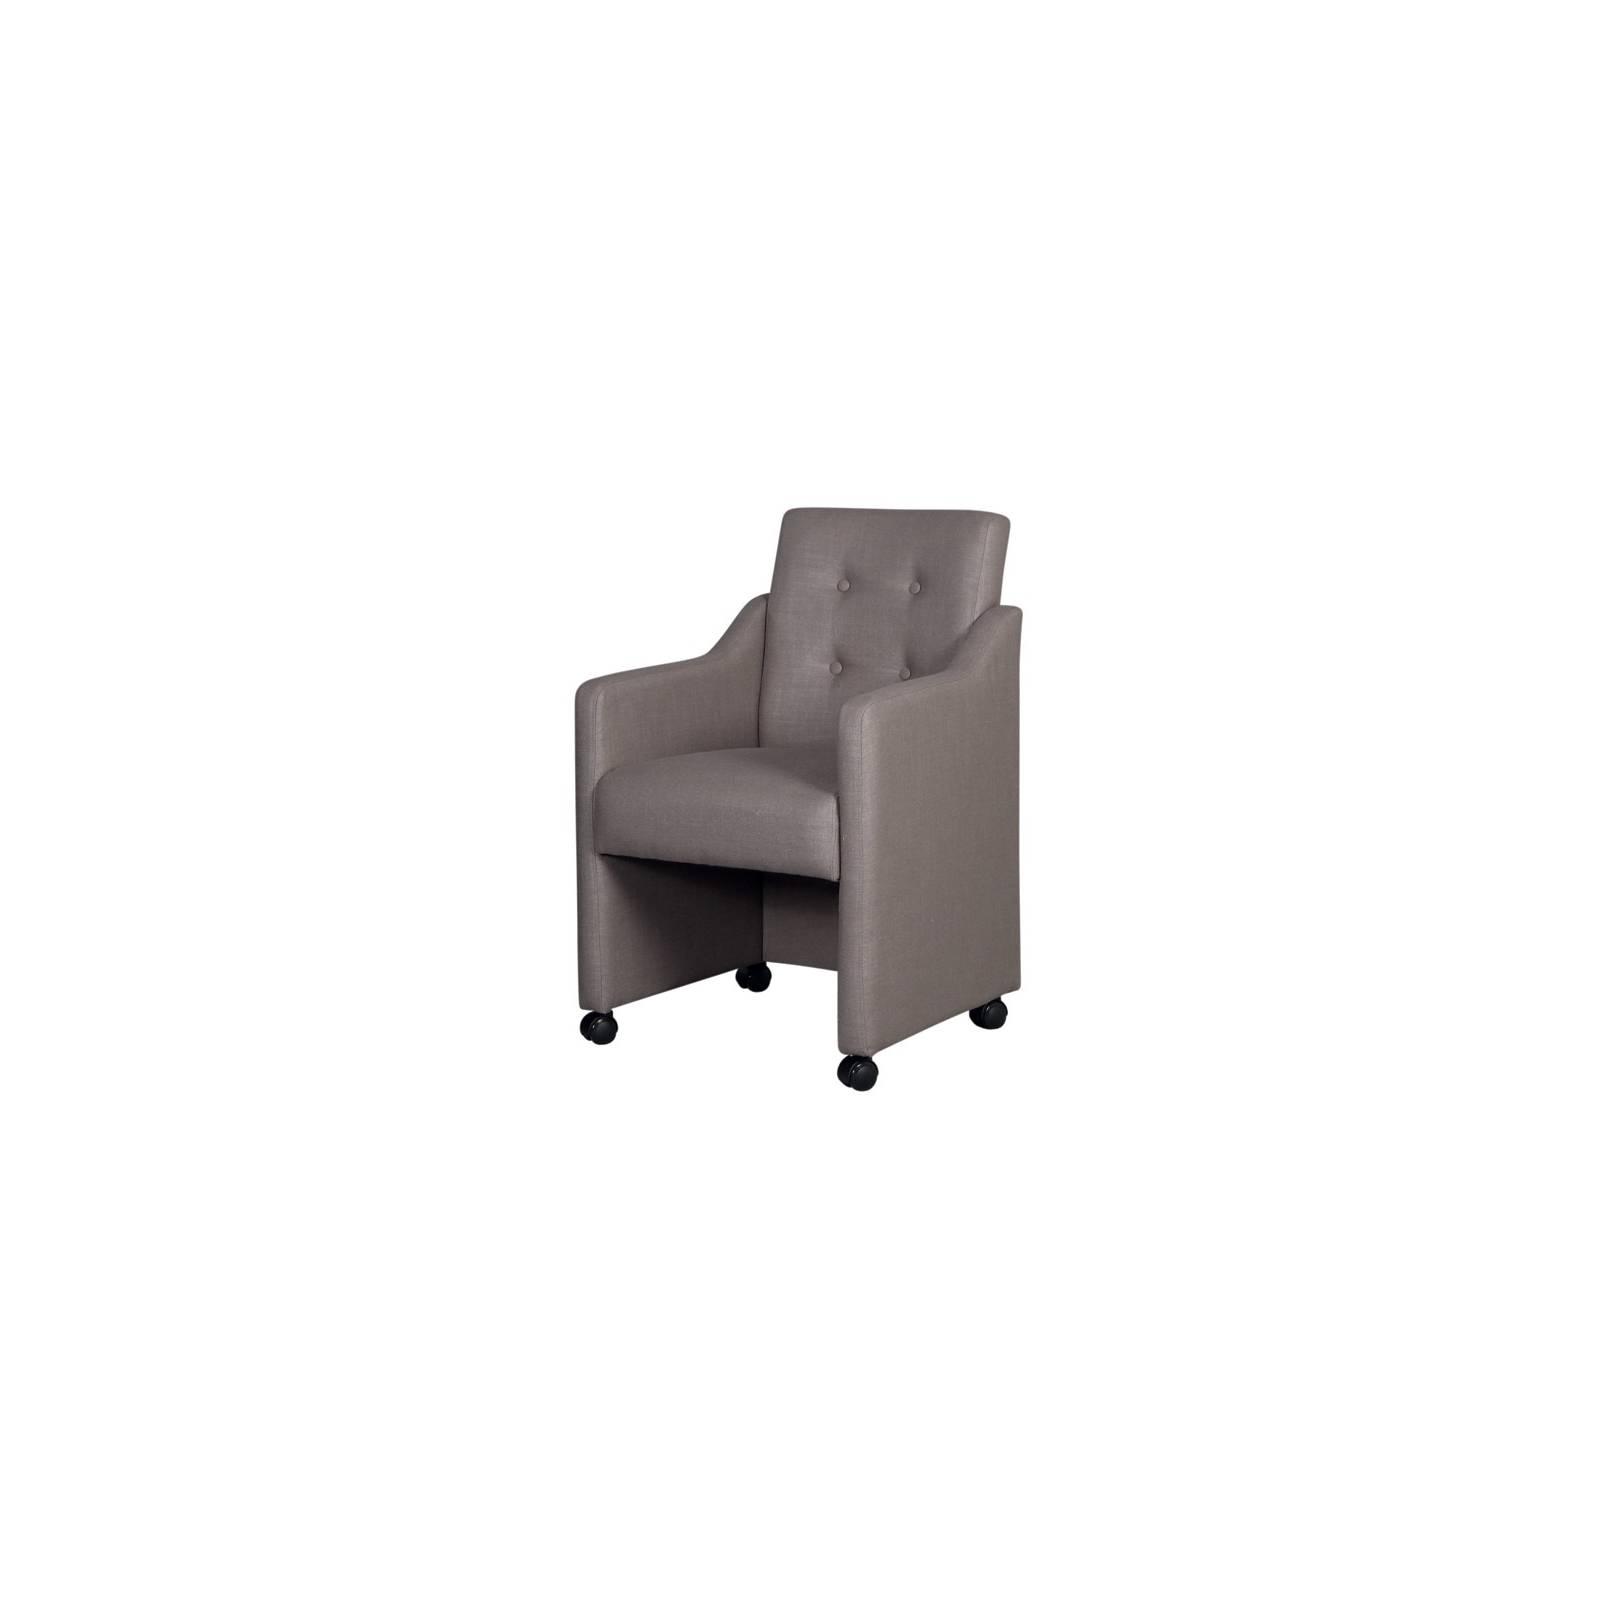 Chaise Monet Tissu - chaise à roulettes